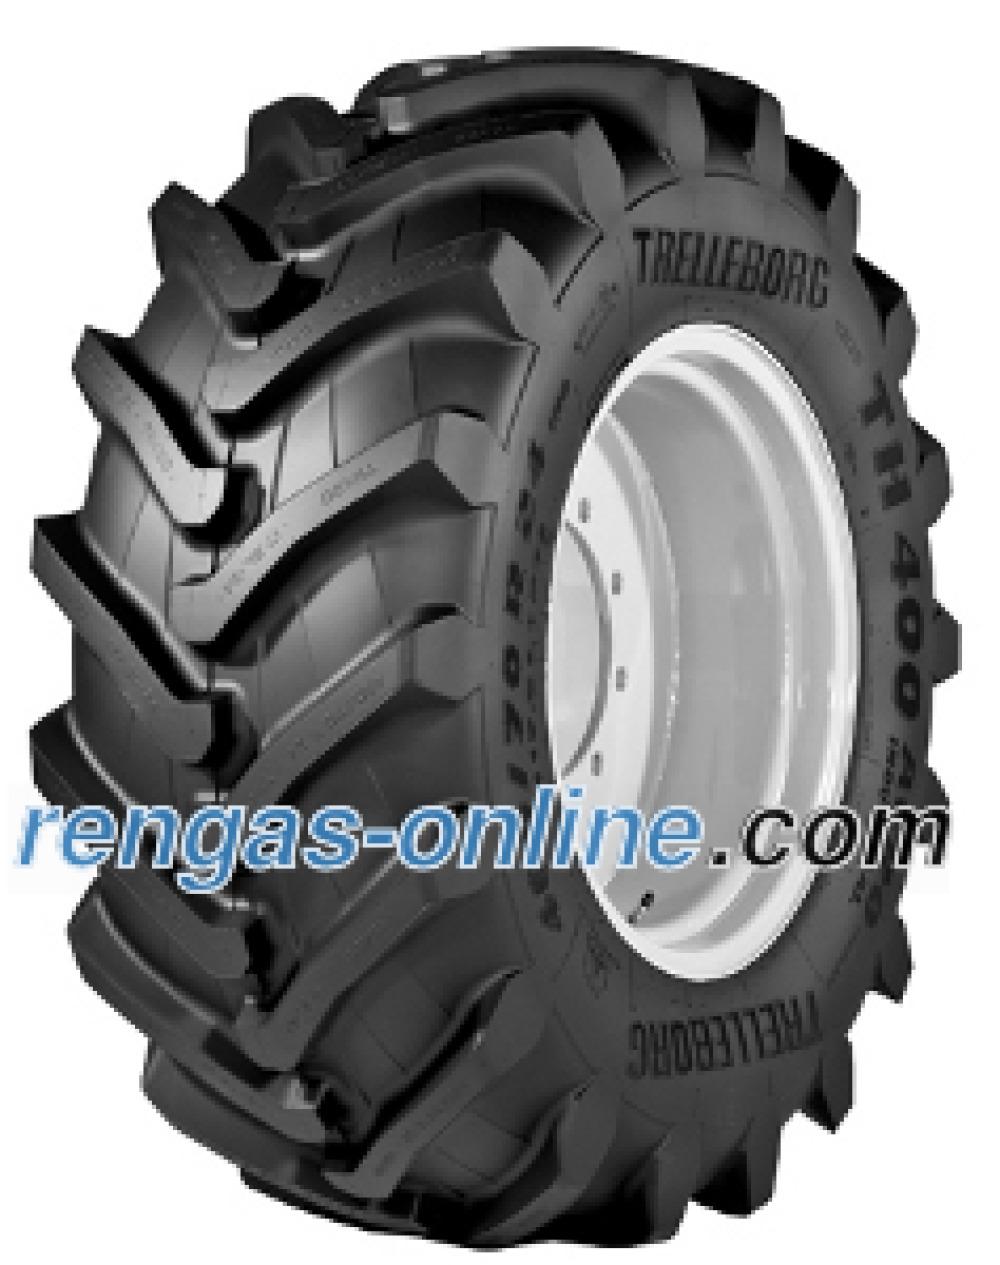 trelleborg-th-400-40070-r18-147a8-tl-kaksoistunnus-147b